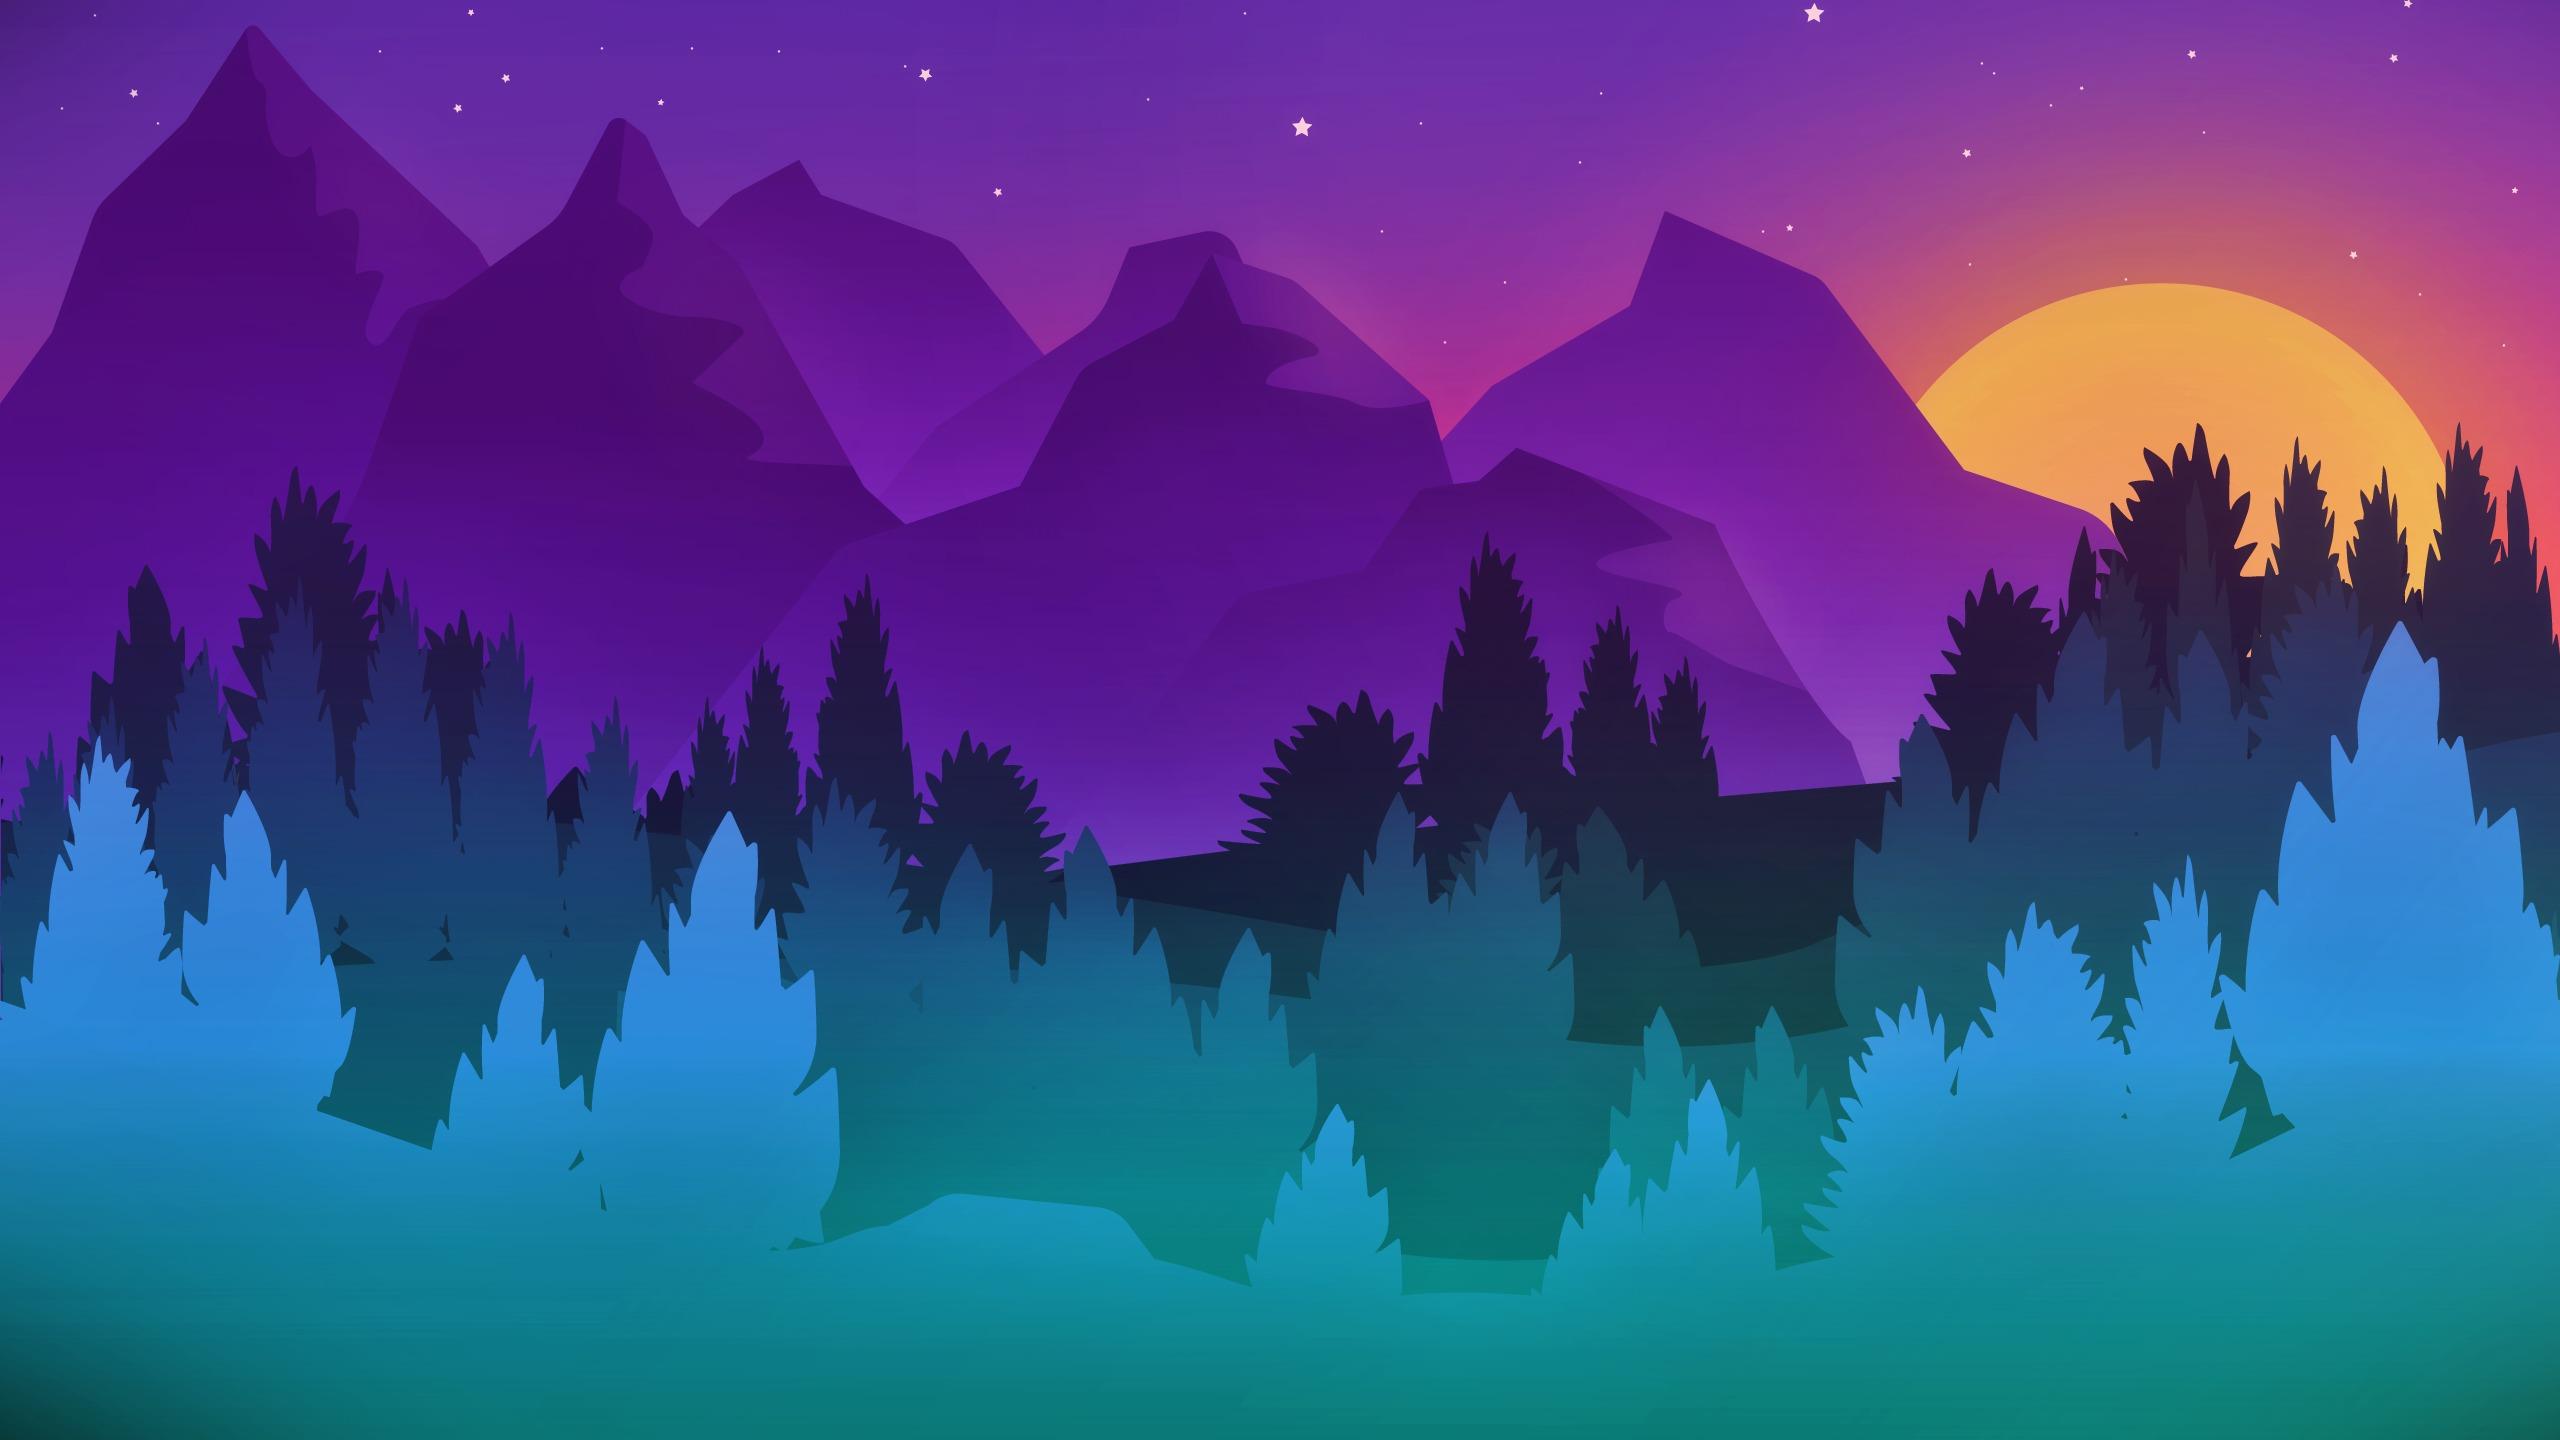 Simple Landscape Hd Wallpaper Background Image 2560x1440